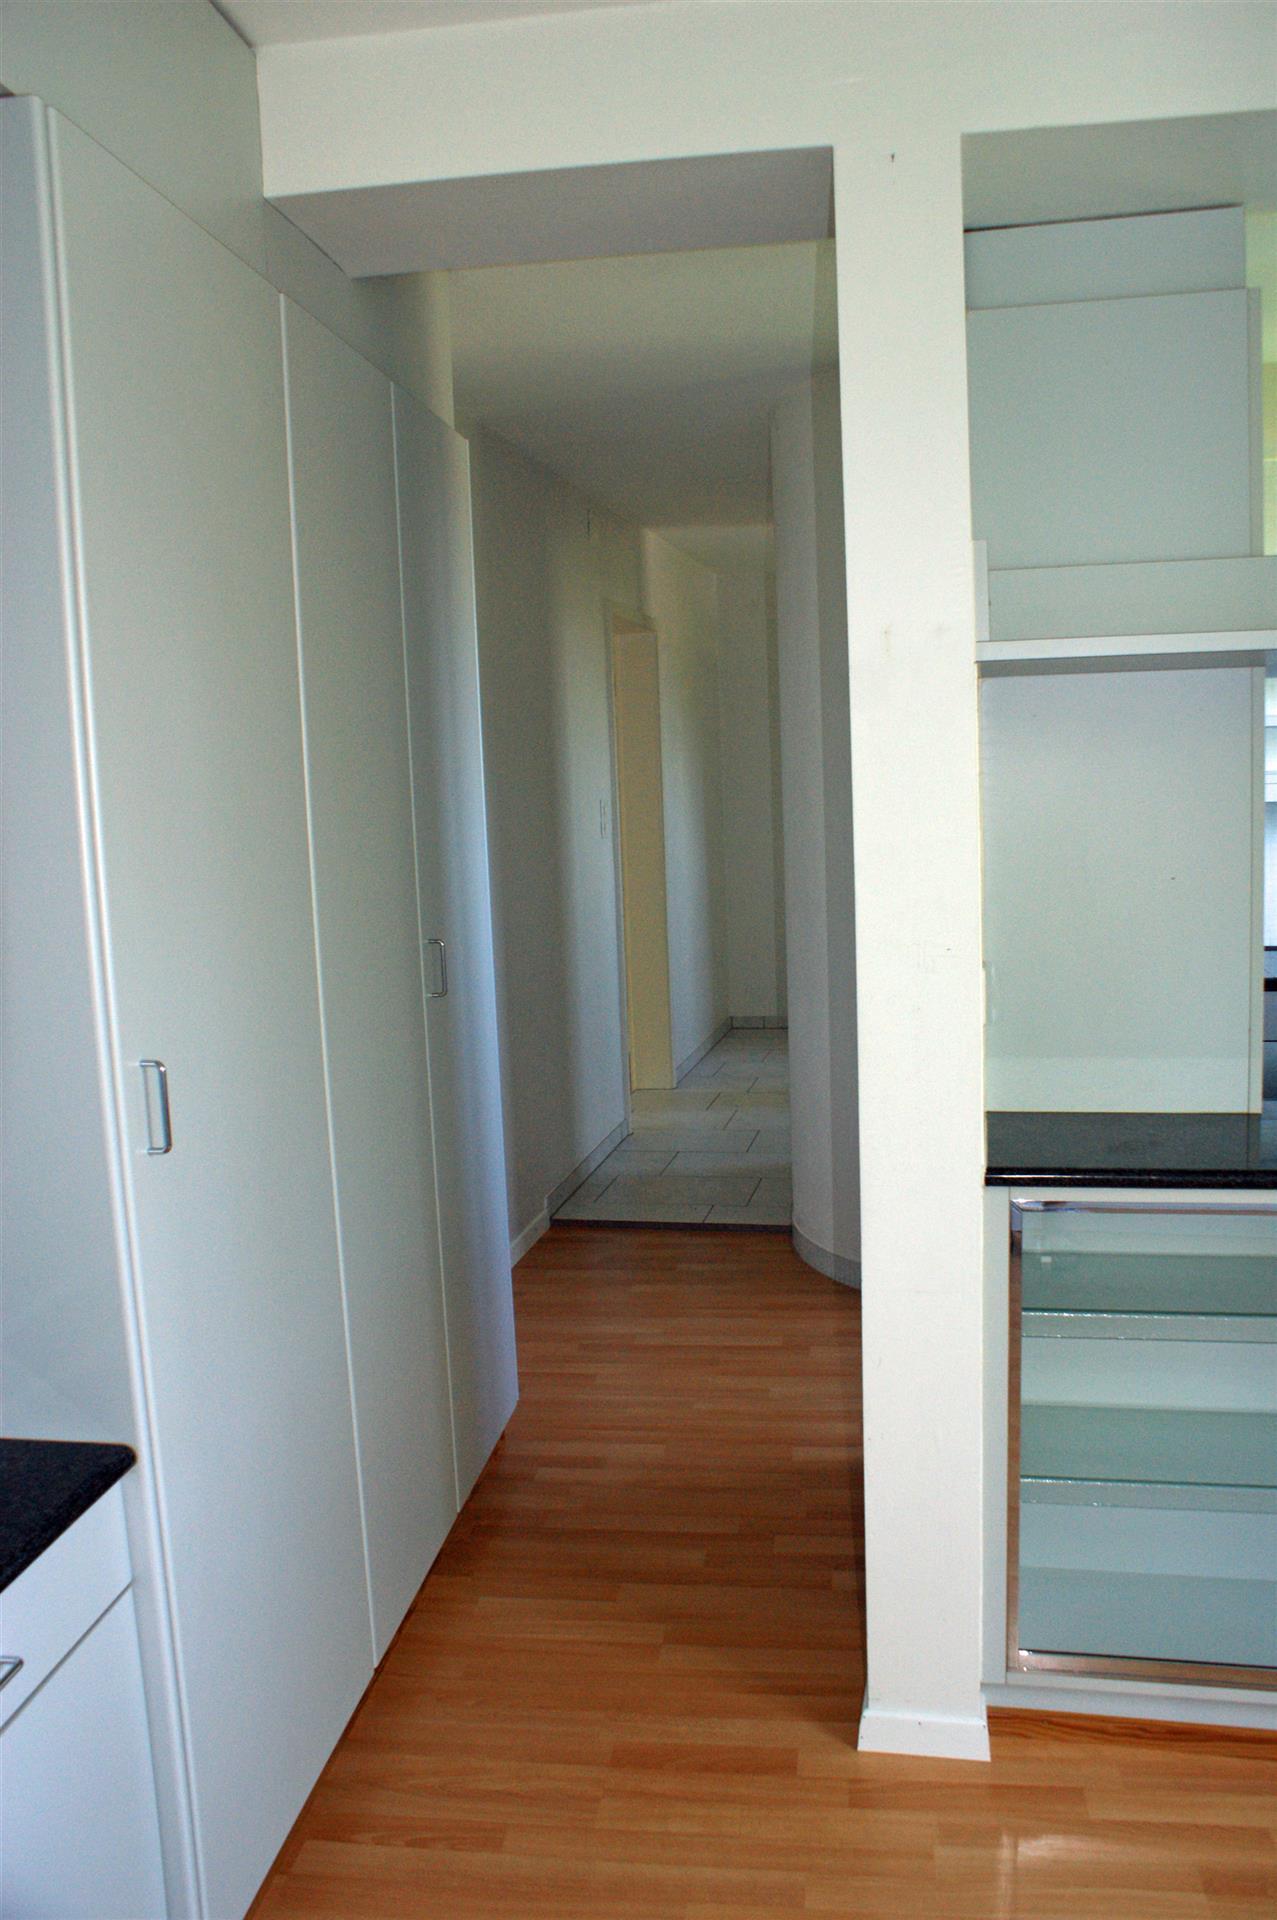 2 5 zimmer garten wohnung eg links. Black Bedroom Furniture Sets. Home Design Ideas